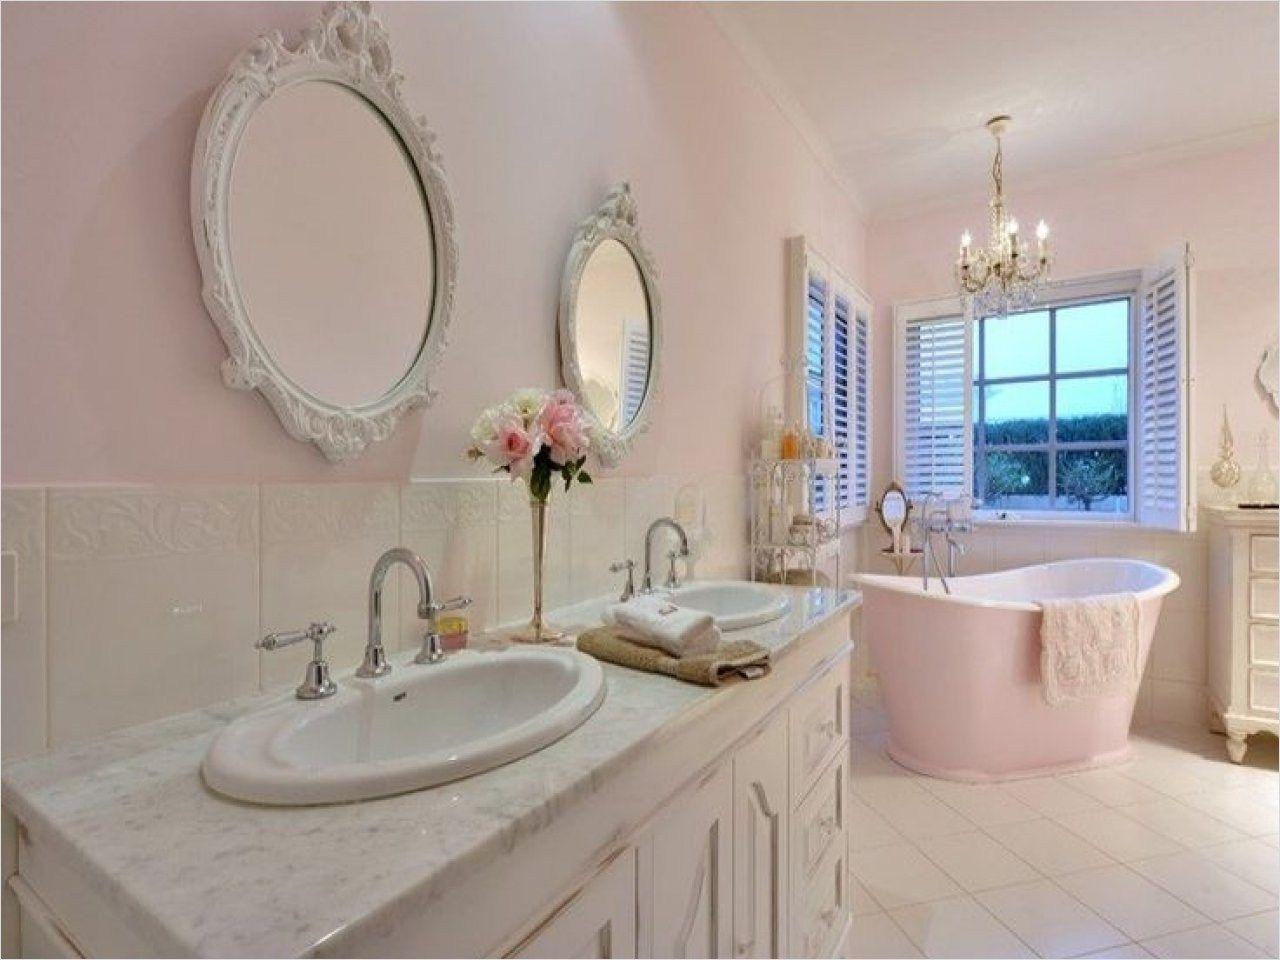 42 Gorgeous Shabby Chic Bathroom Accessories Ideas